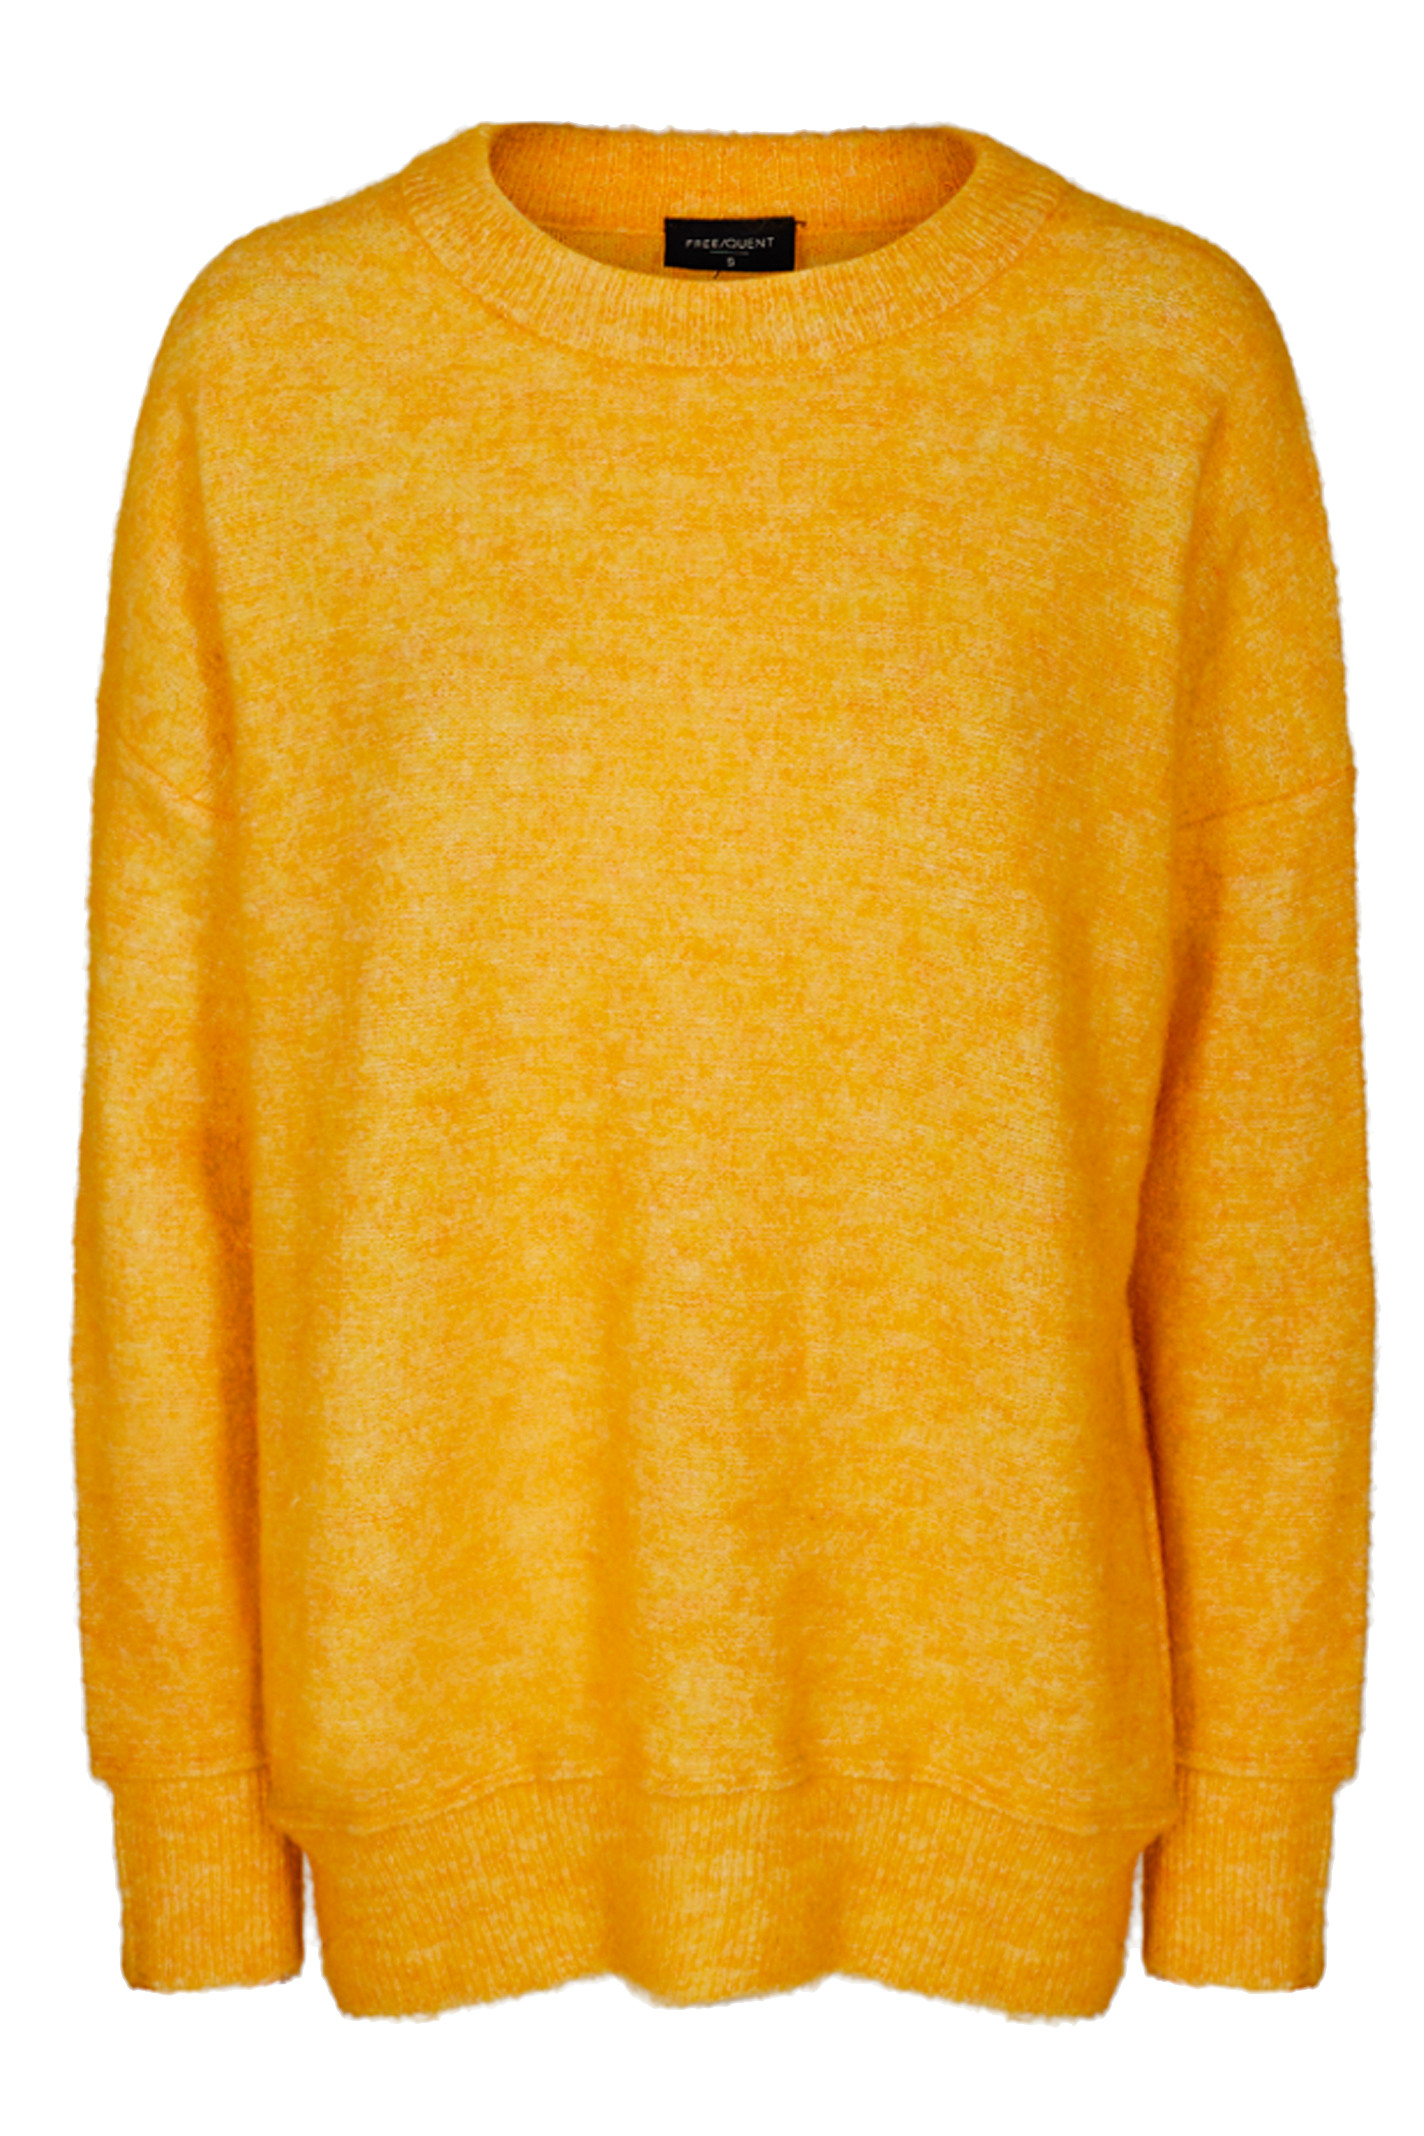 FreeQuent MOTO-PU-ROUND Golden Yellow